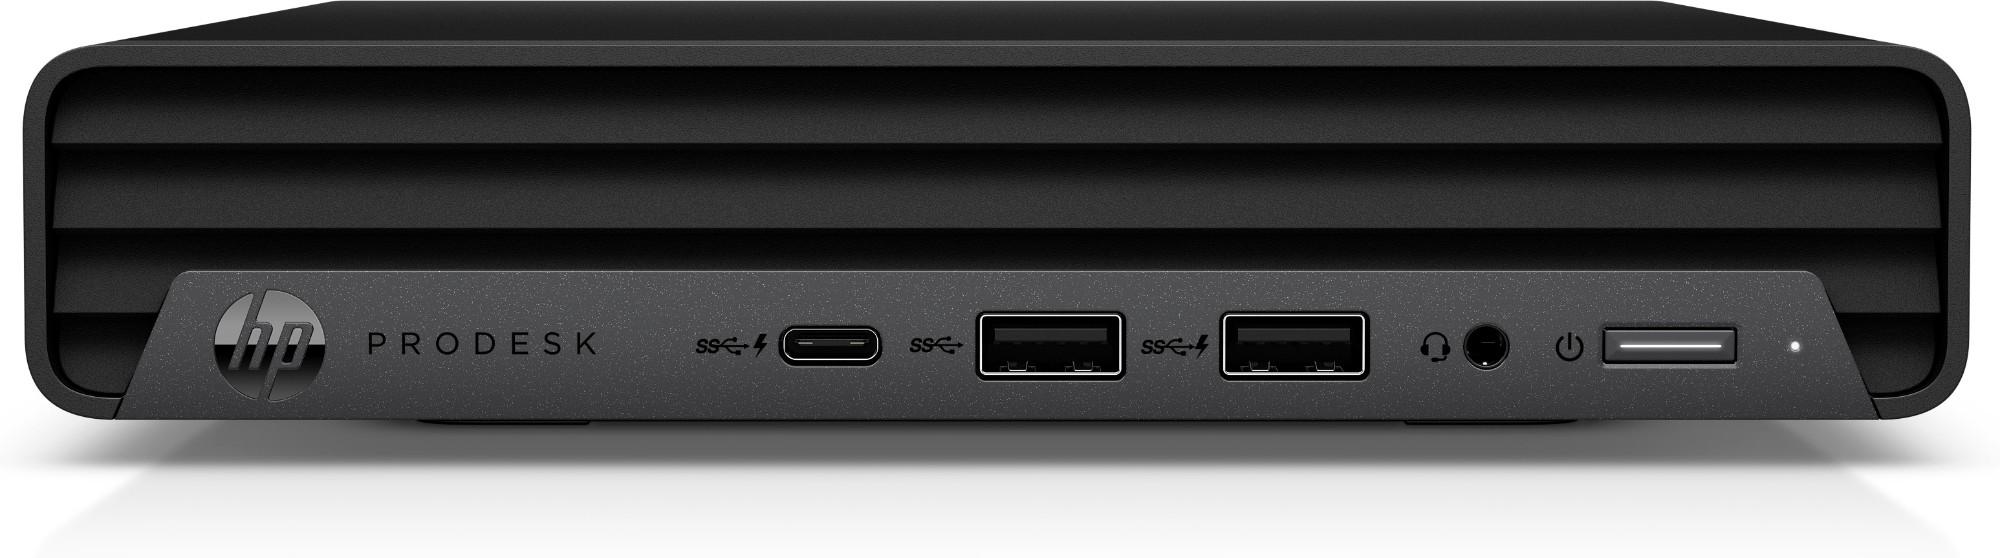 HP ProDesk 600 G6 Desktop Mini PC Intel® Core™ i5 de 10ma Generación i5-10500 16 GB DDR4-SDRAM 512 GB SSD Negro Windows 10 Pro